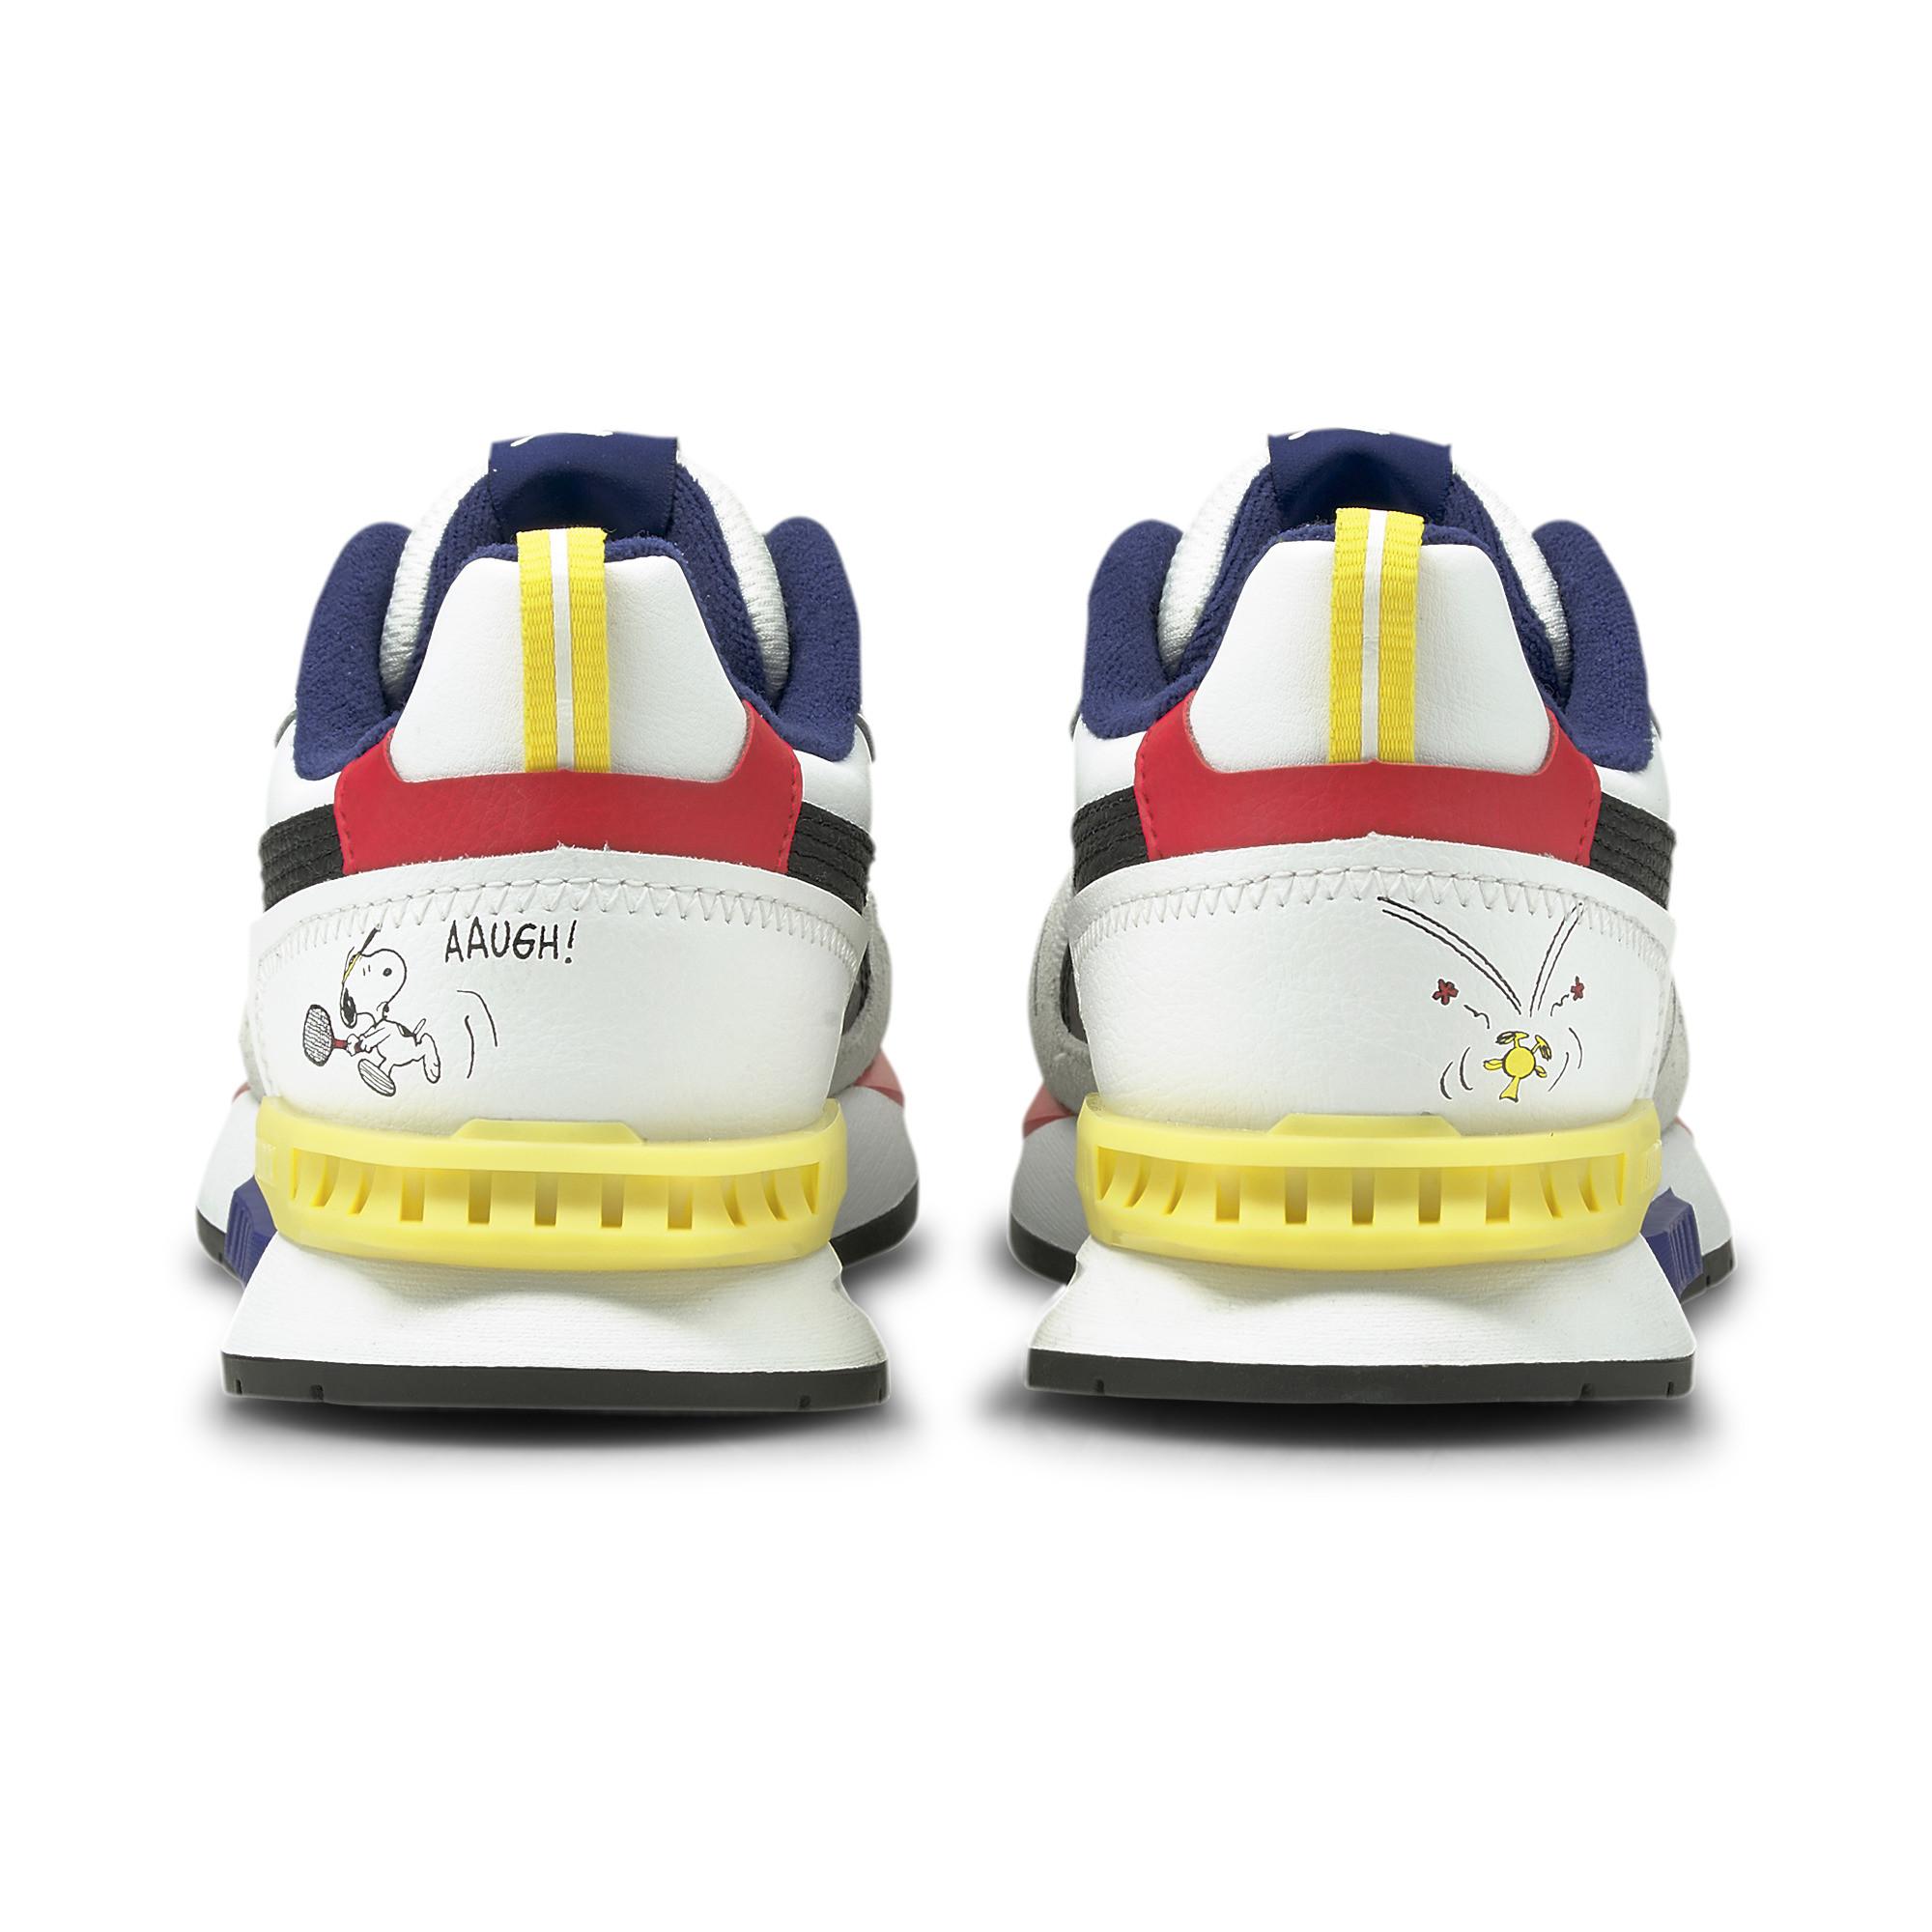 Peanuts x Puma Kids MIRAGEMOX ピーナッツ x プーマ キッズ ミラージュ モックス 色:Puma White-Elektro Blue